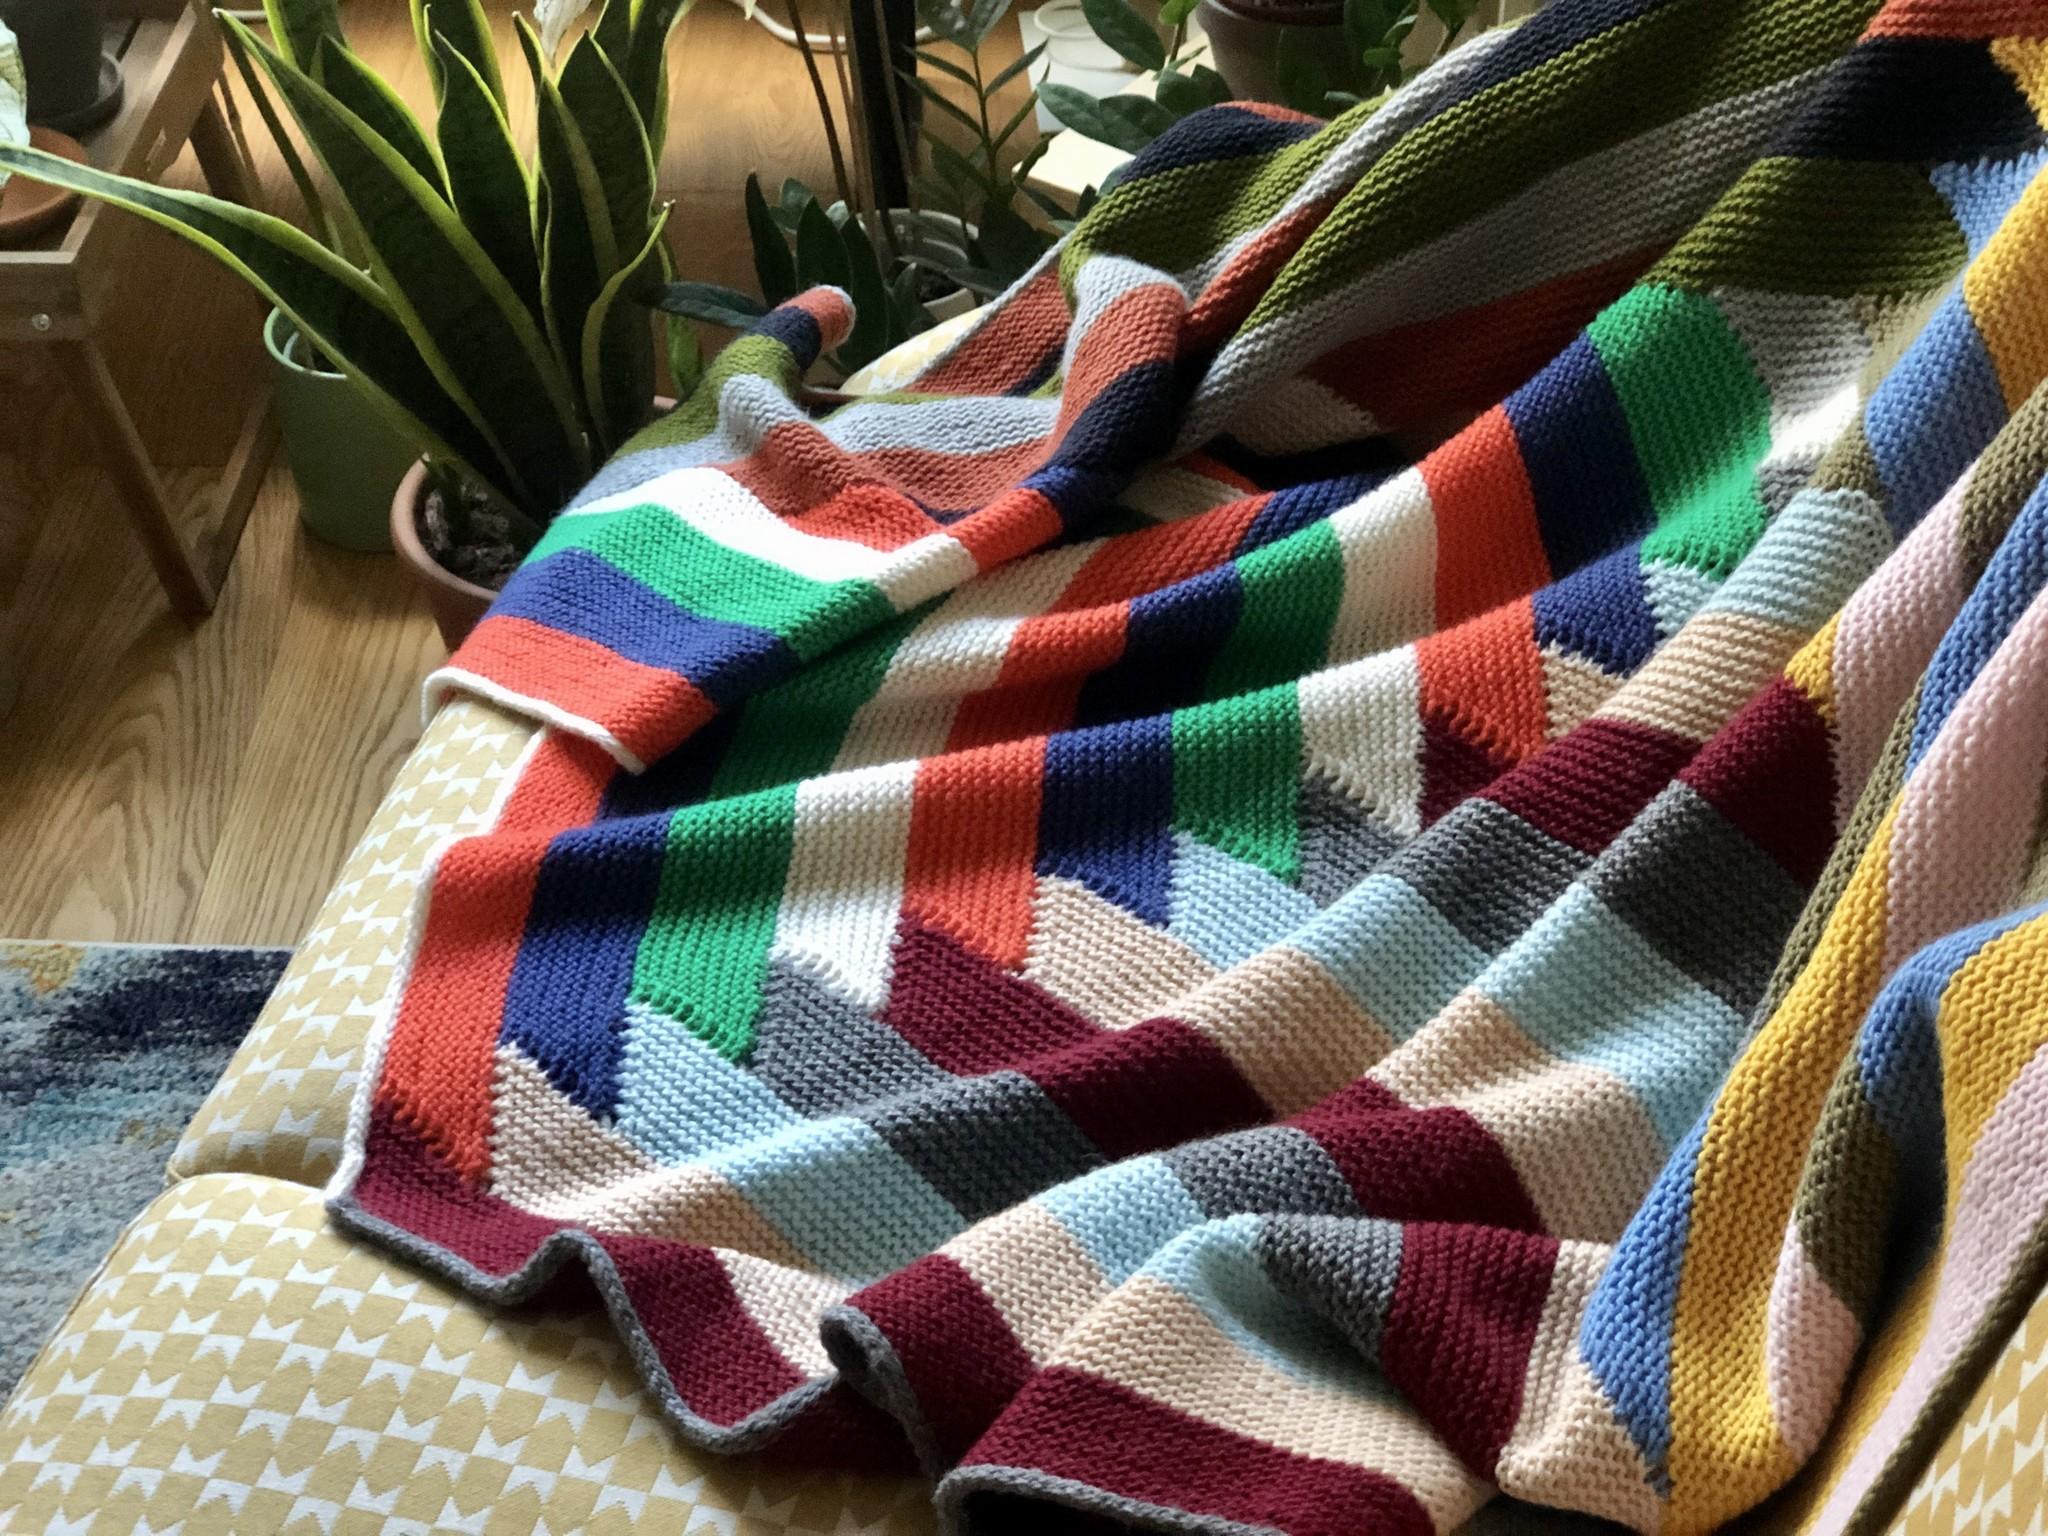 Parallelolamb Blanket Stephen Penelope